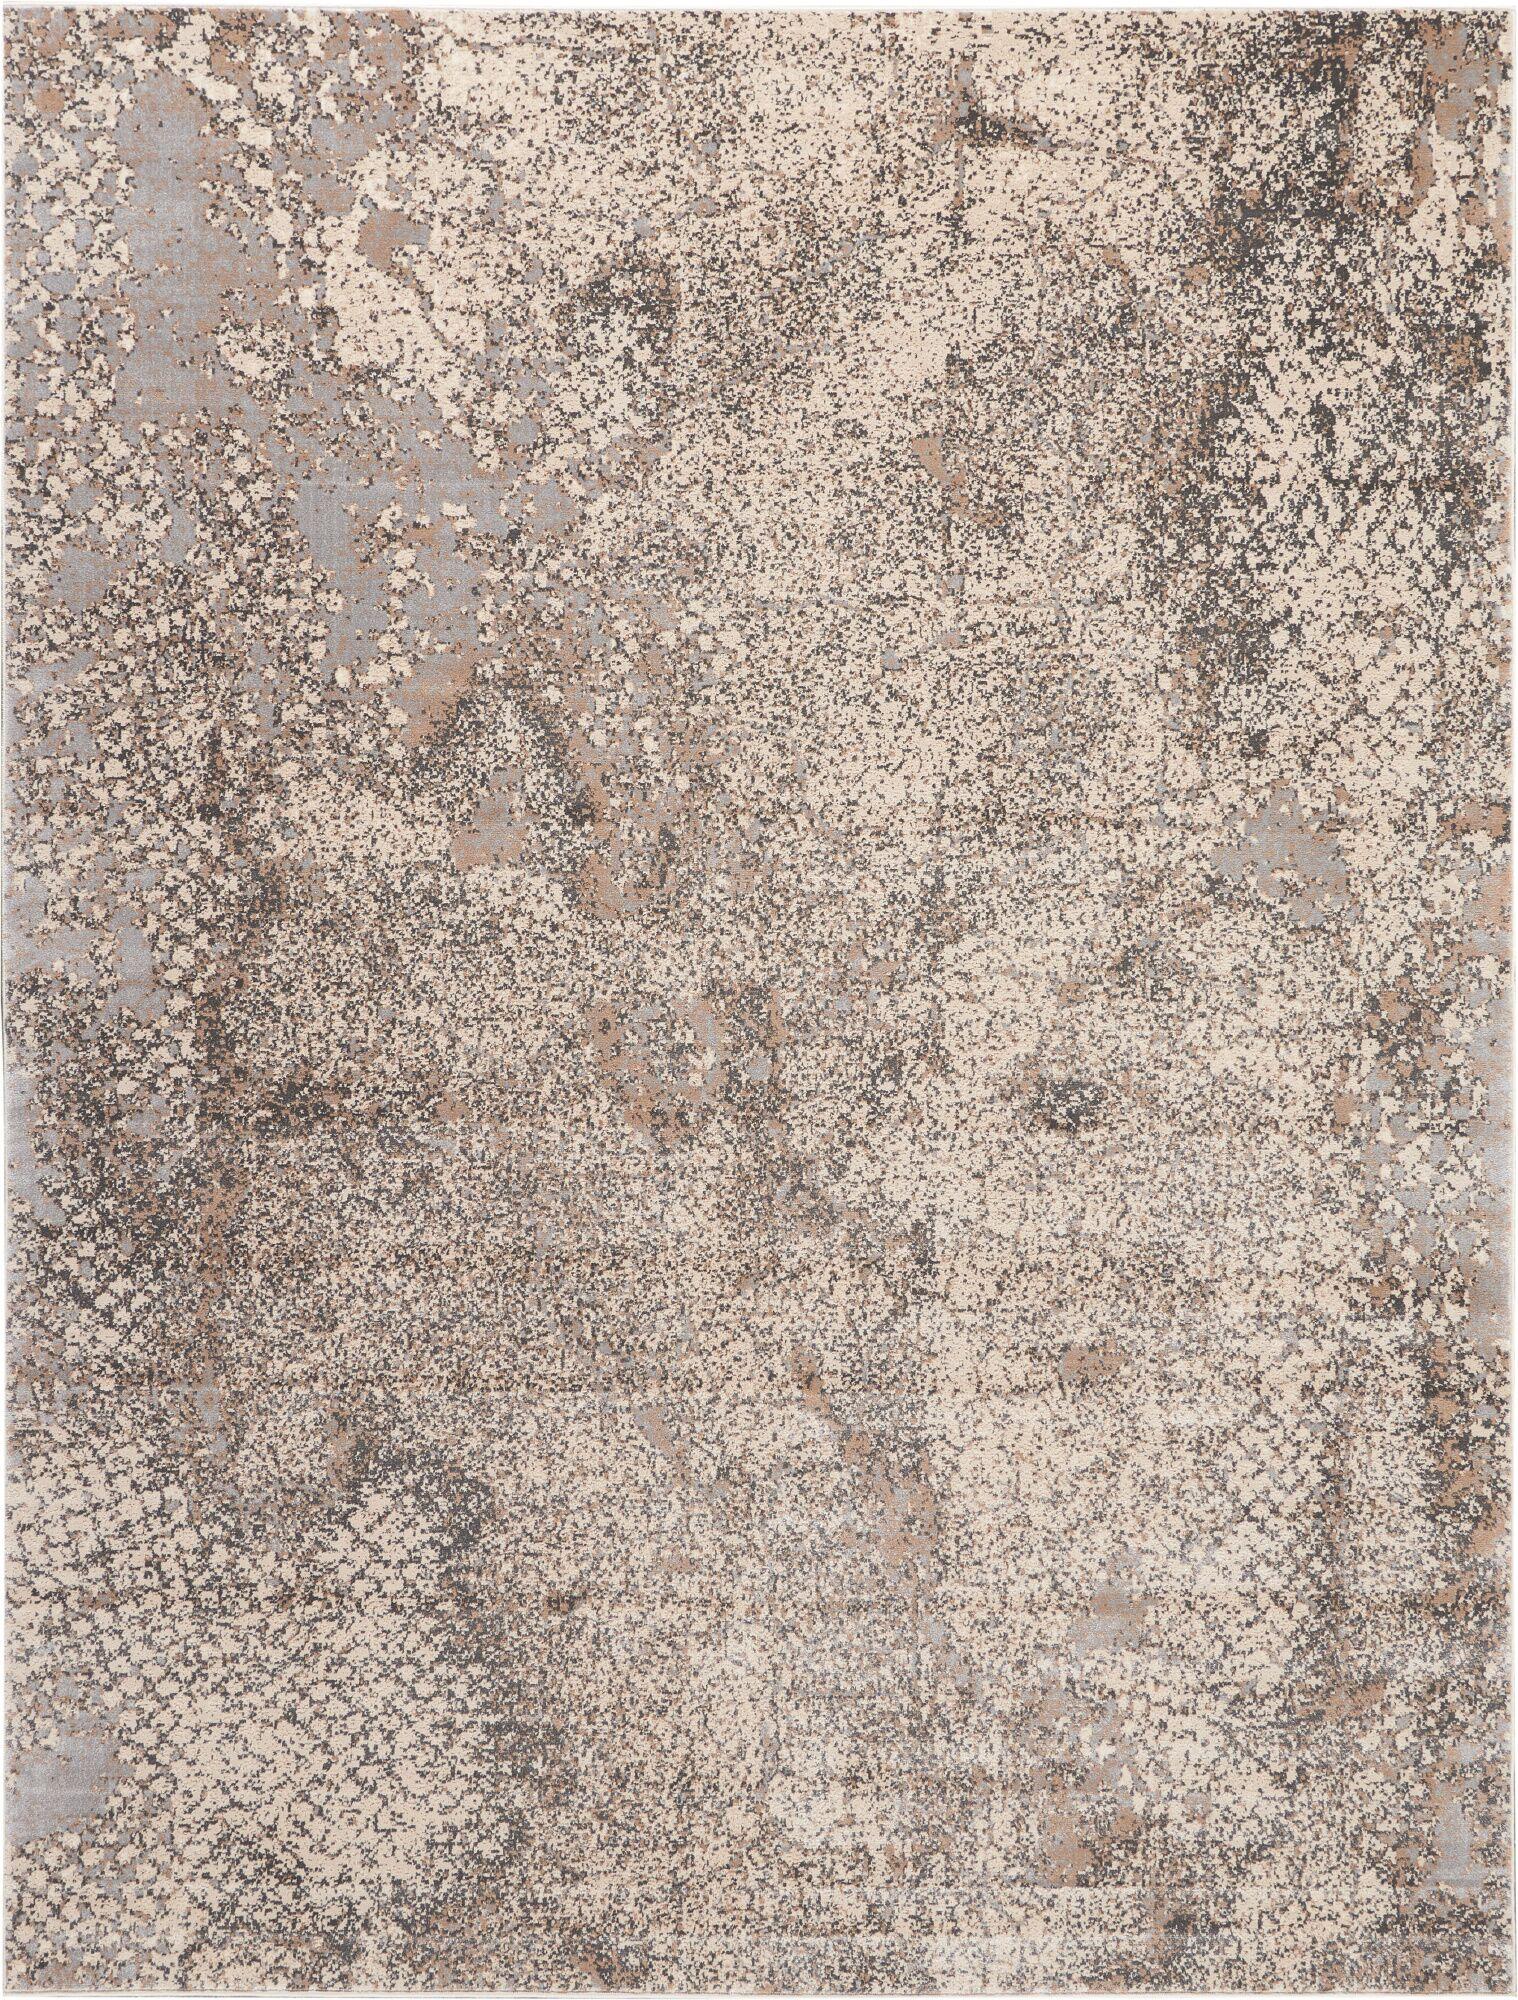 Heritage Gray Area Rug Rug Size: Rectangle 5'2